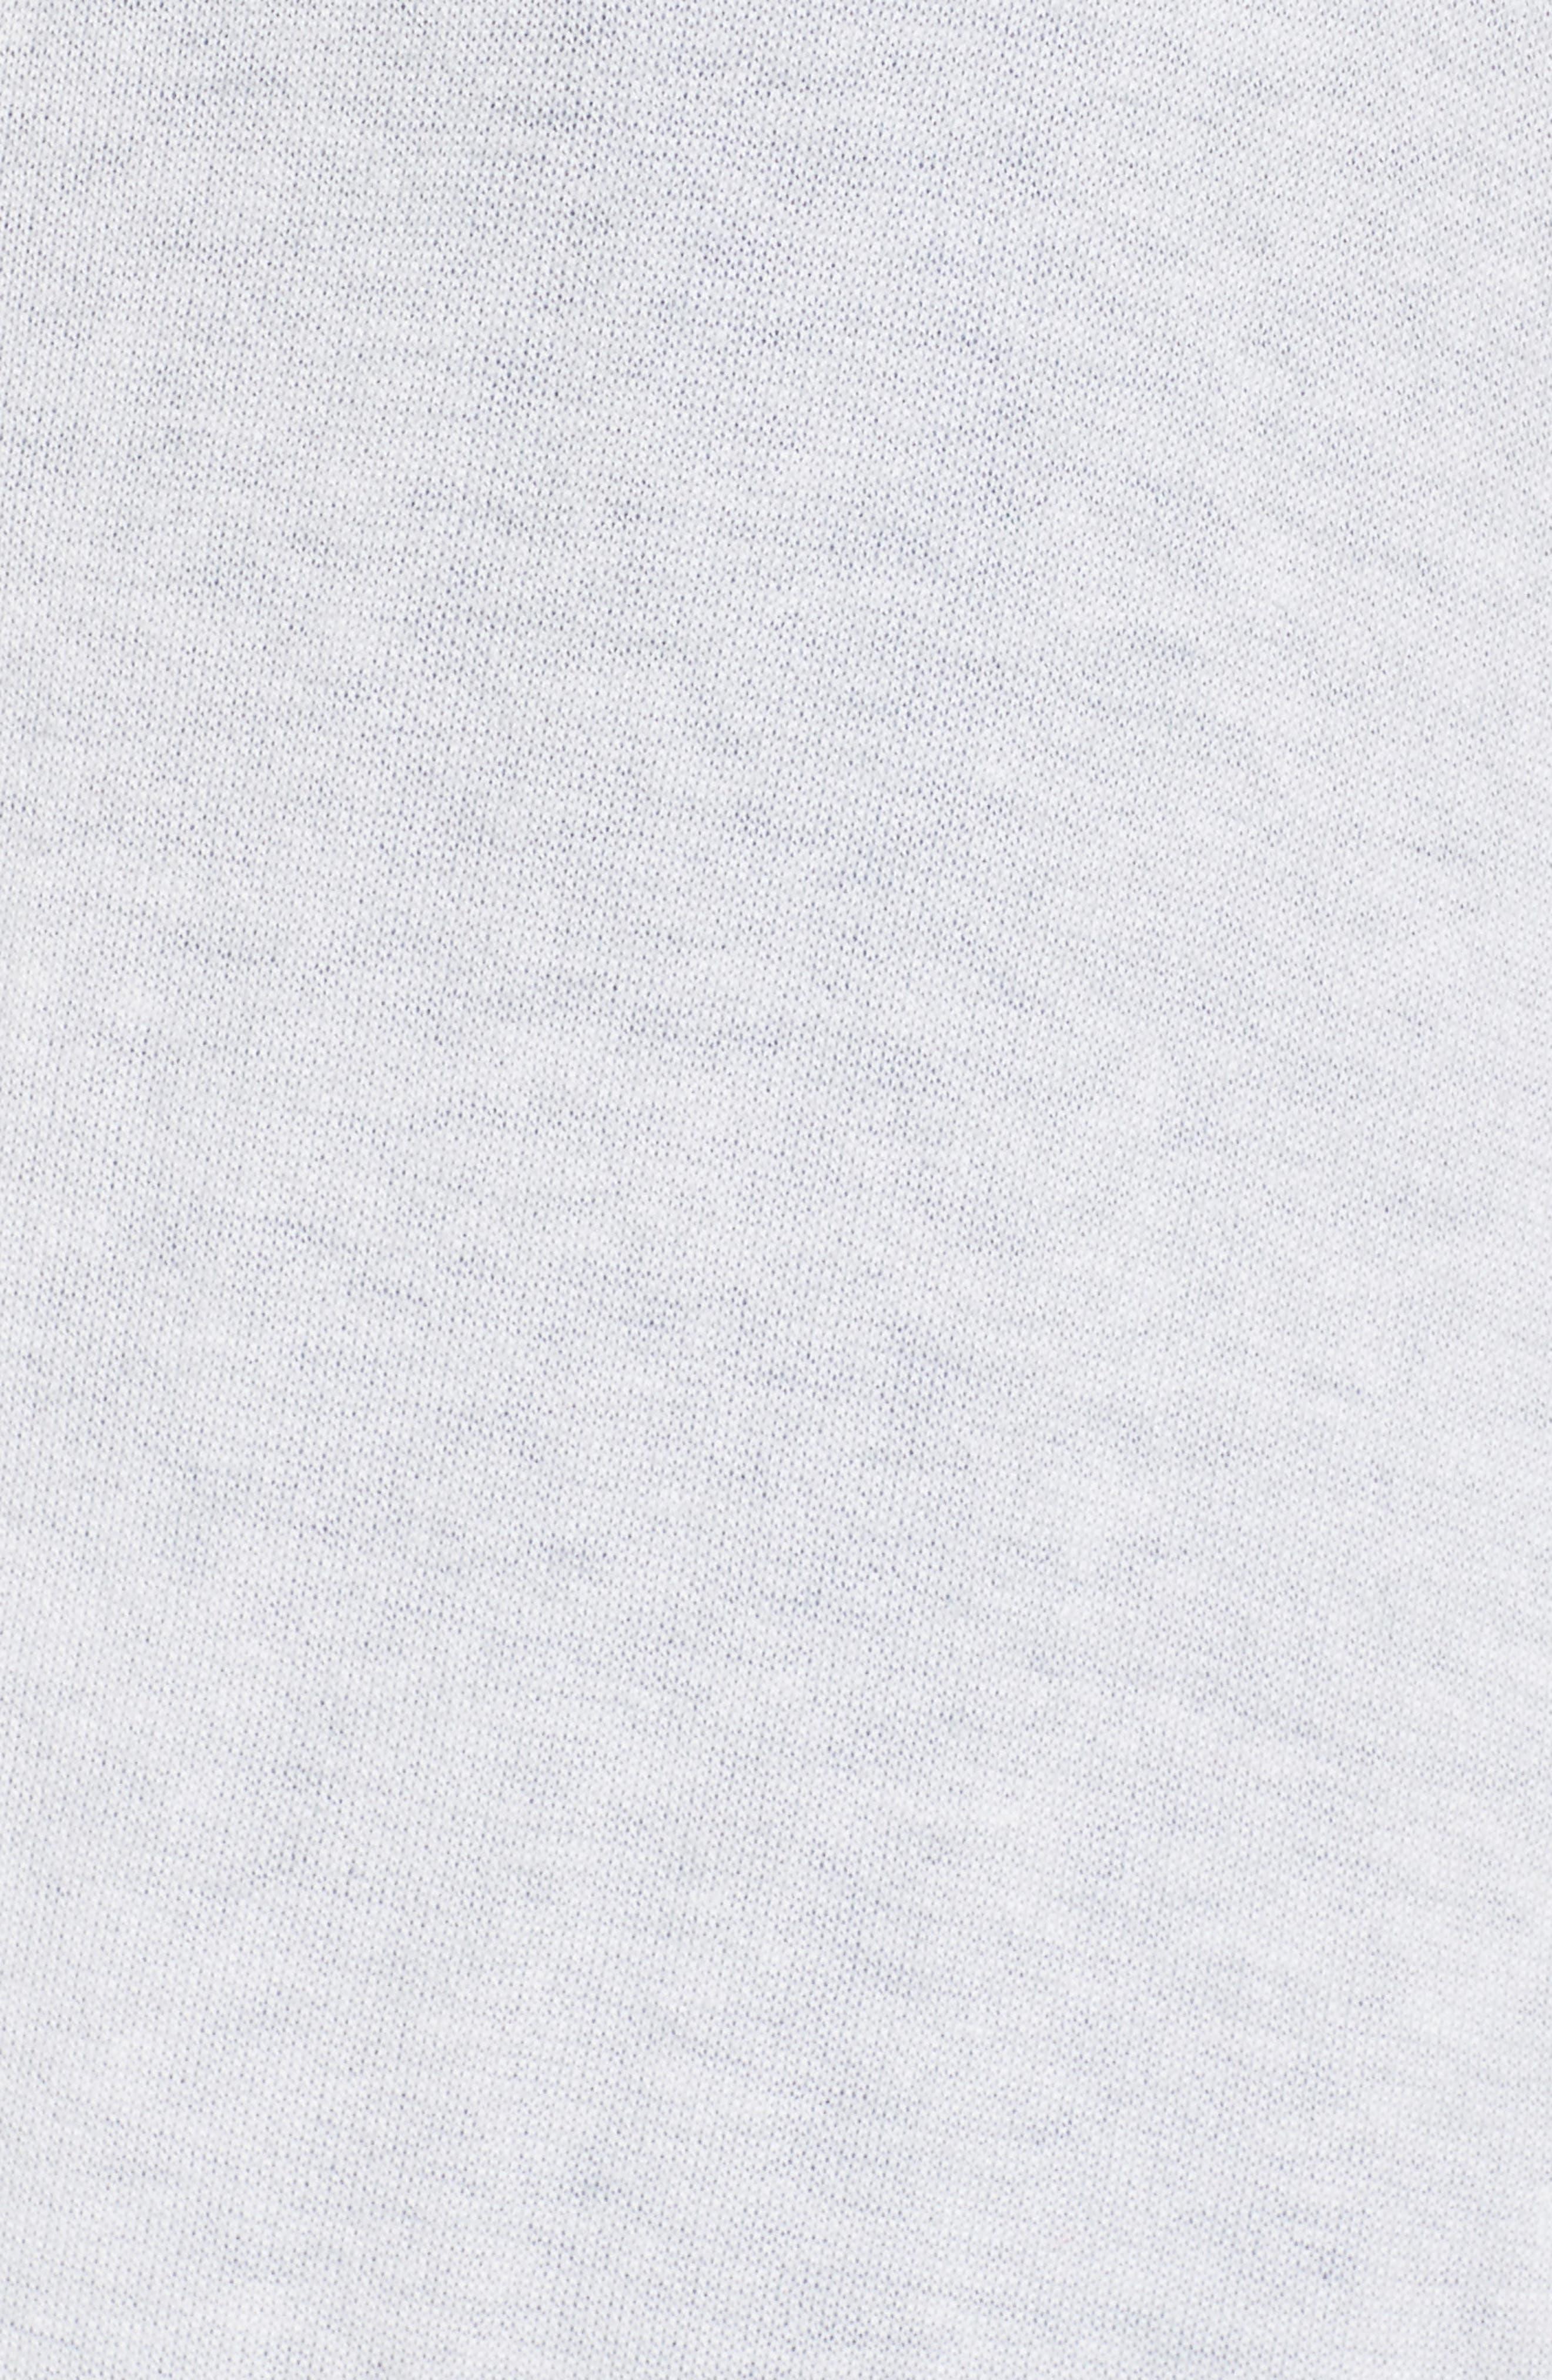 Traveler Long Cardigan,                             Alternate thumbnail 6, color,                             Putty Mix